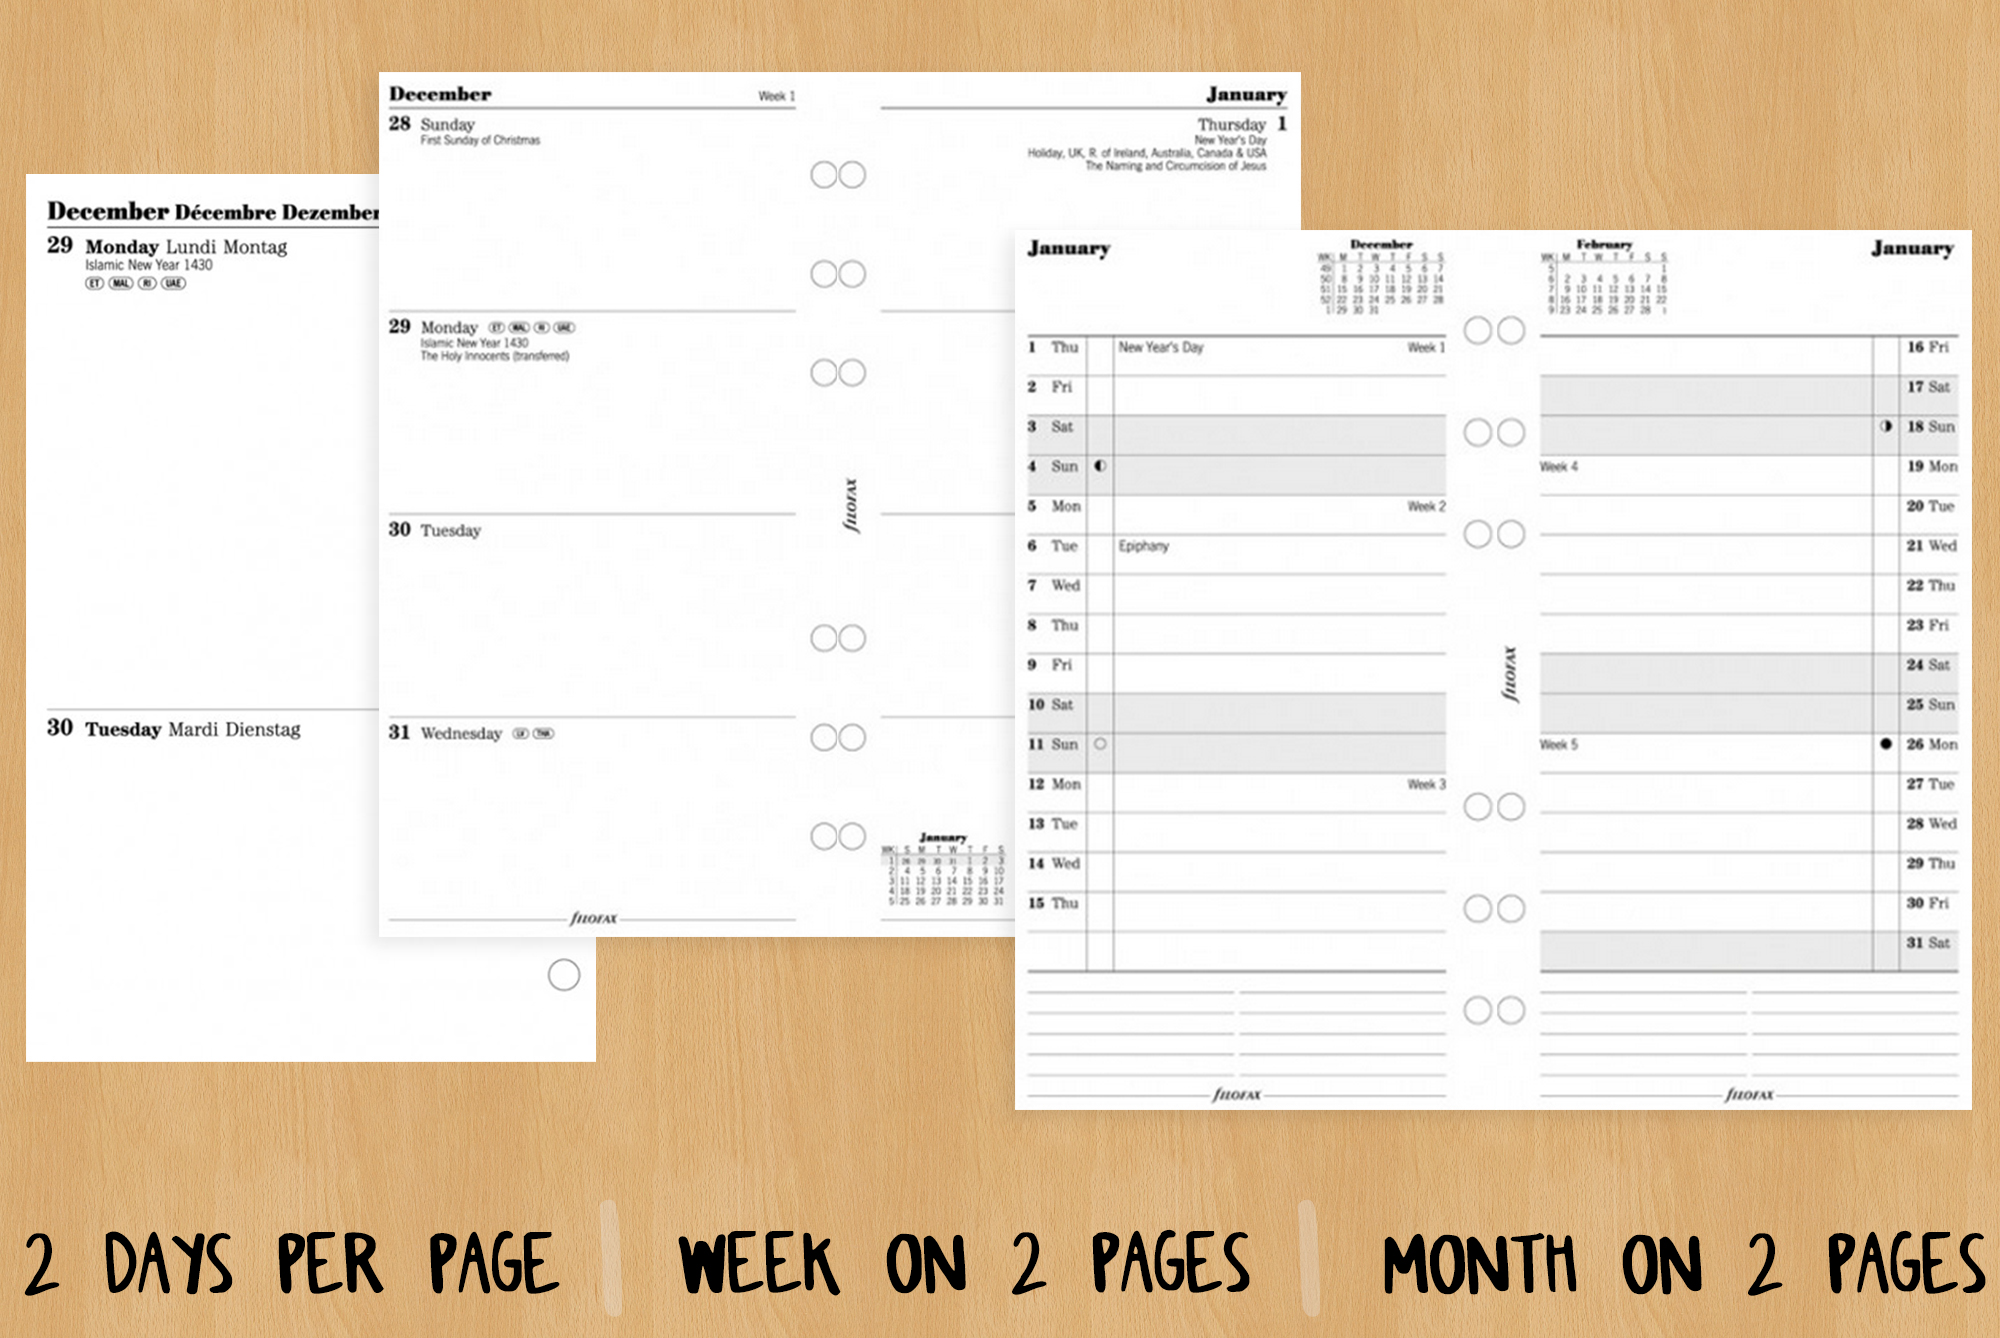 filofax_paper_size_chart copy1.jpg